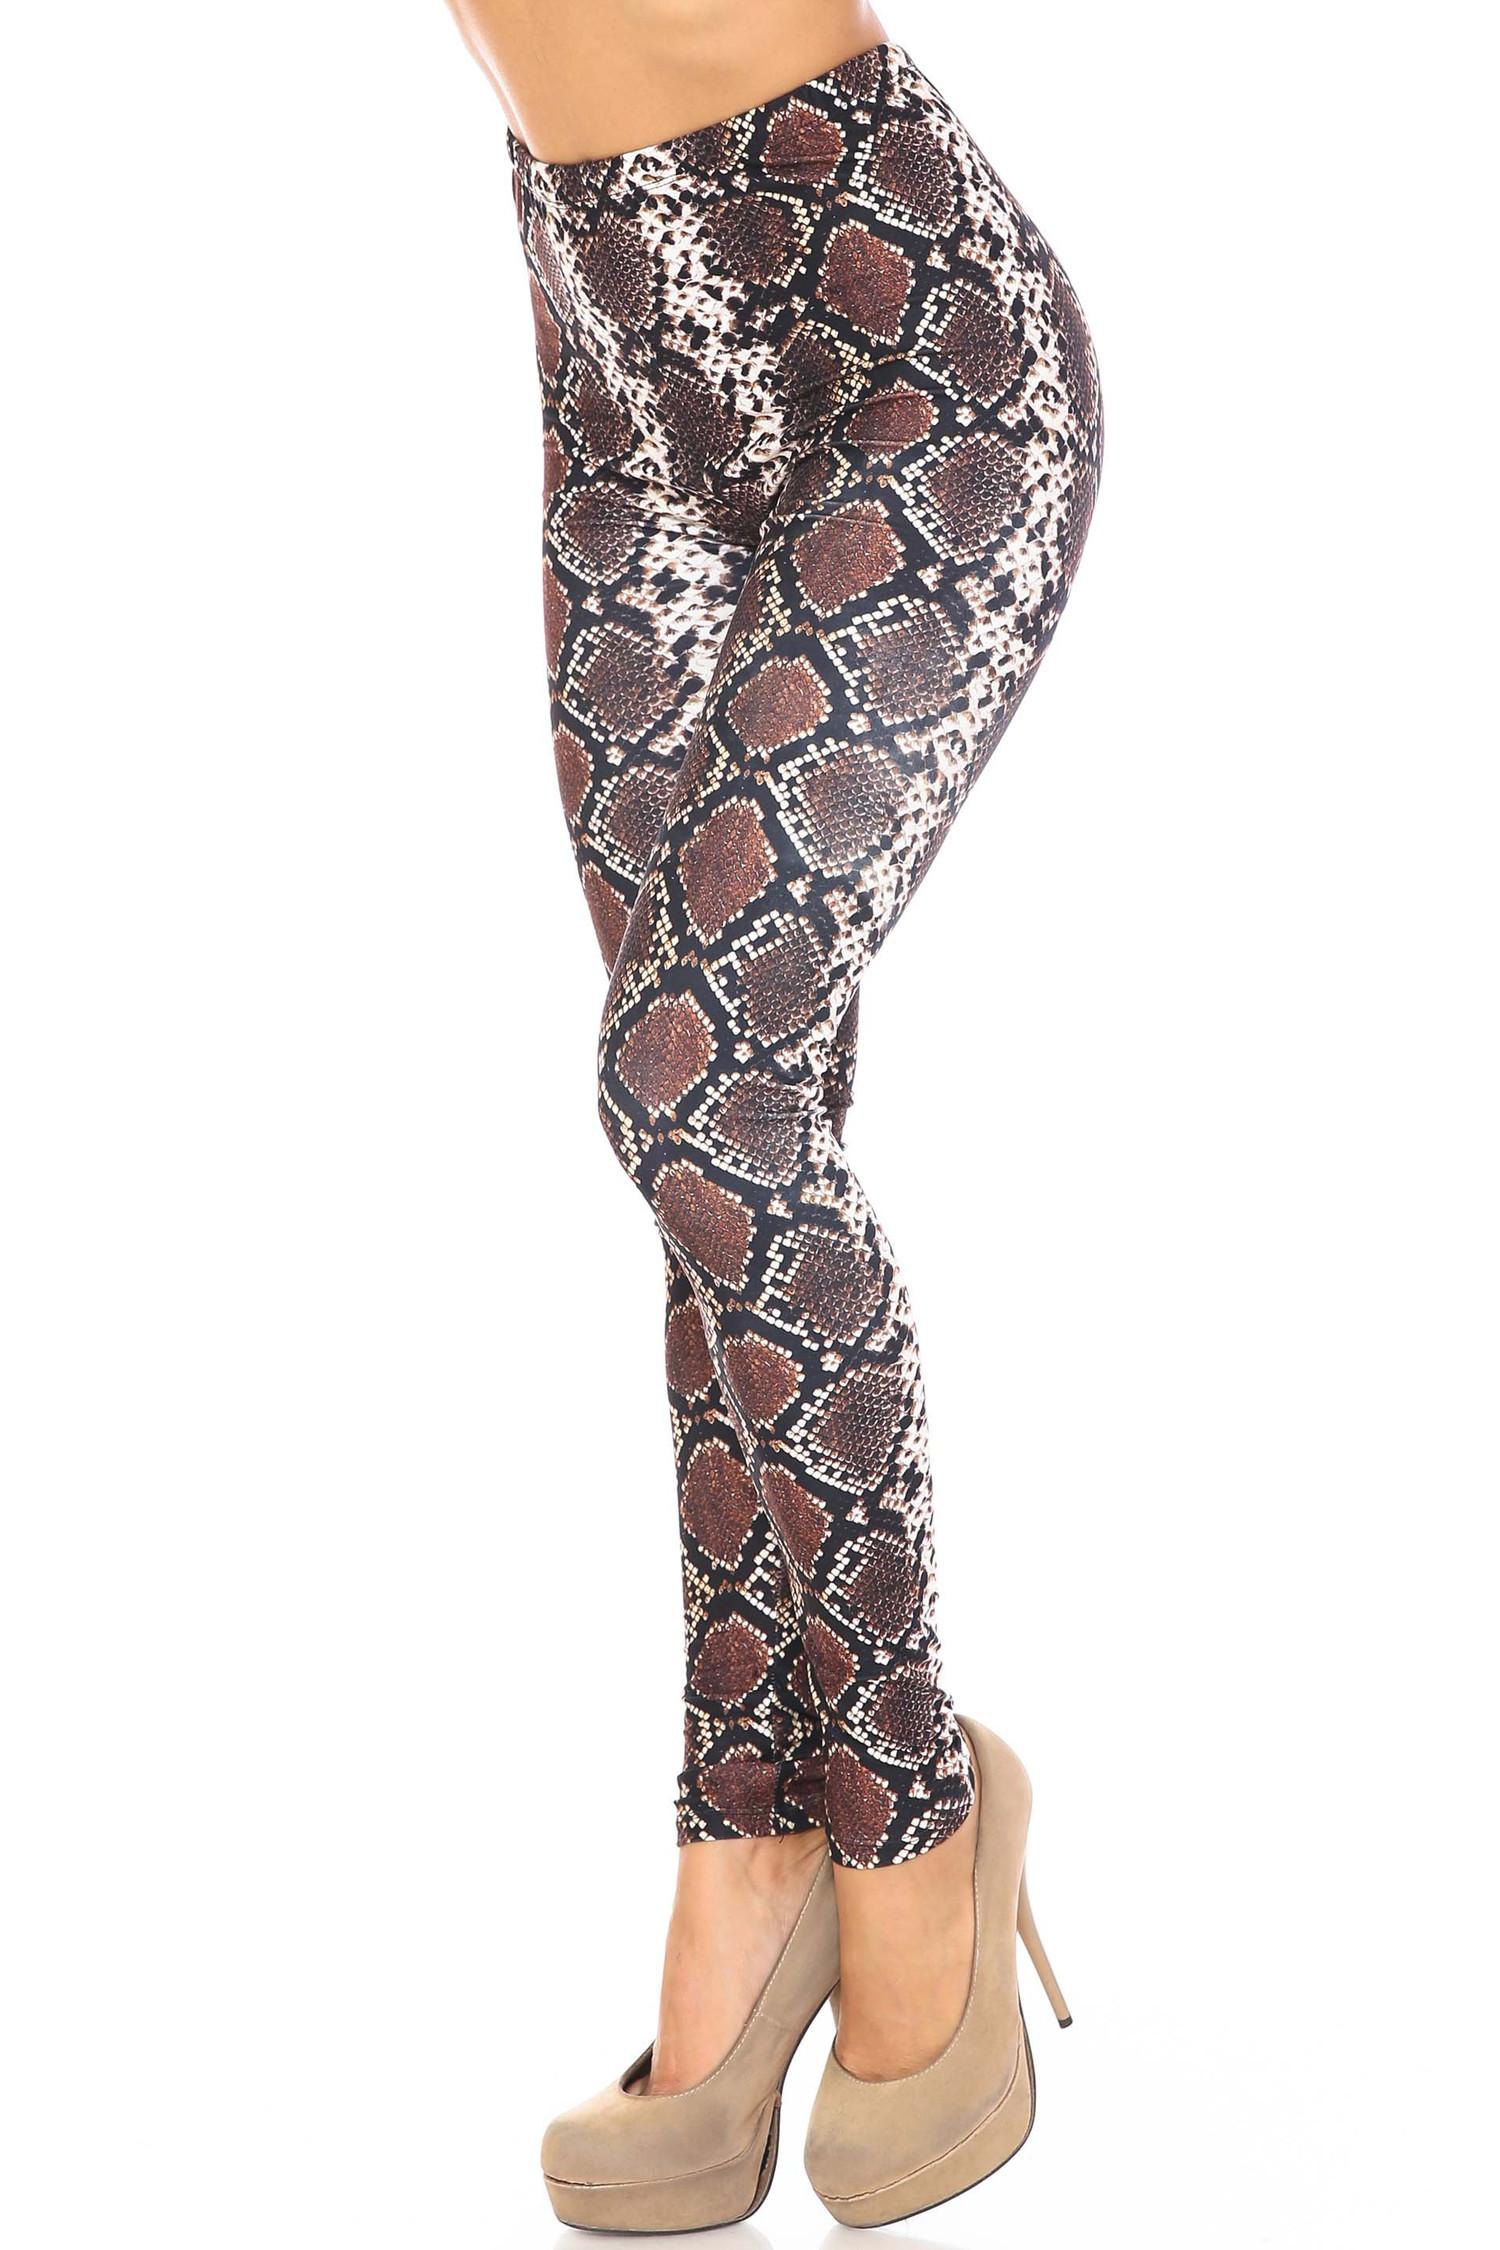 Left side of Creamy Soft  Brown Boa Snake Leggings - USA Fashion™